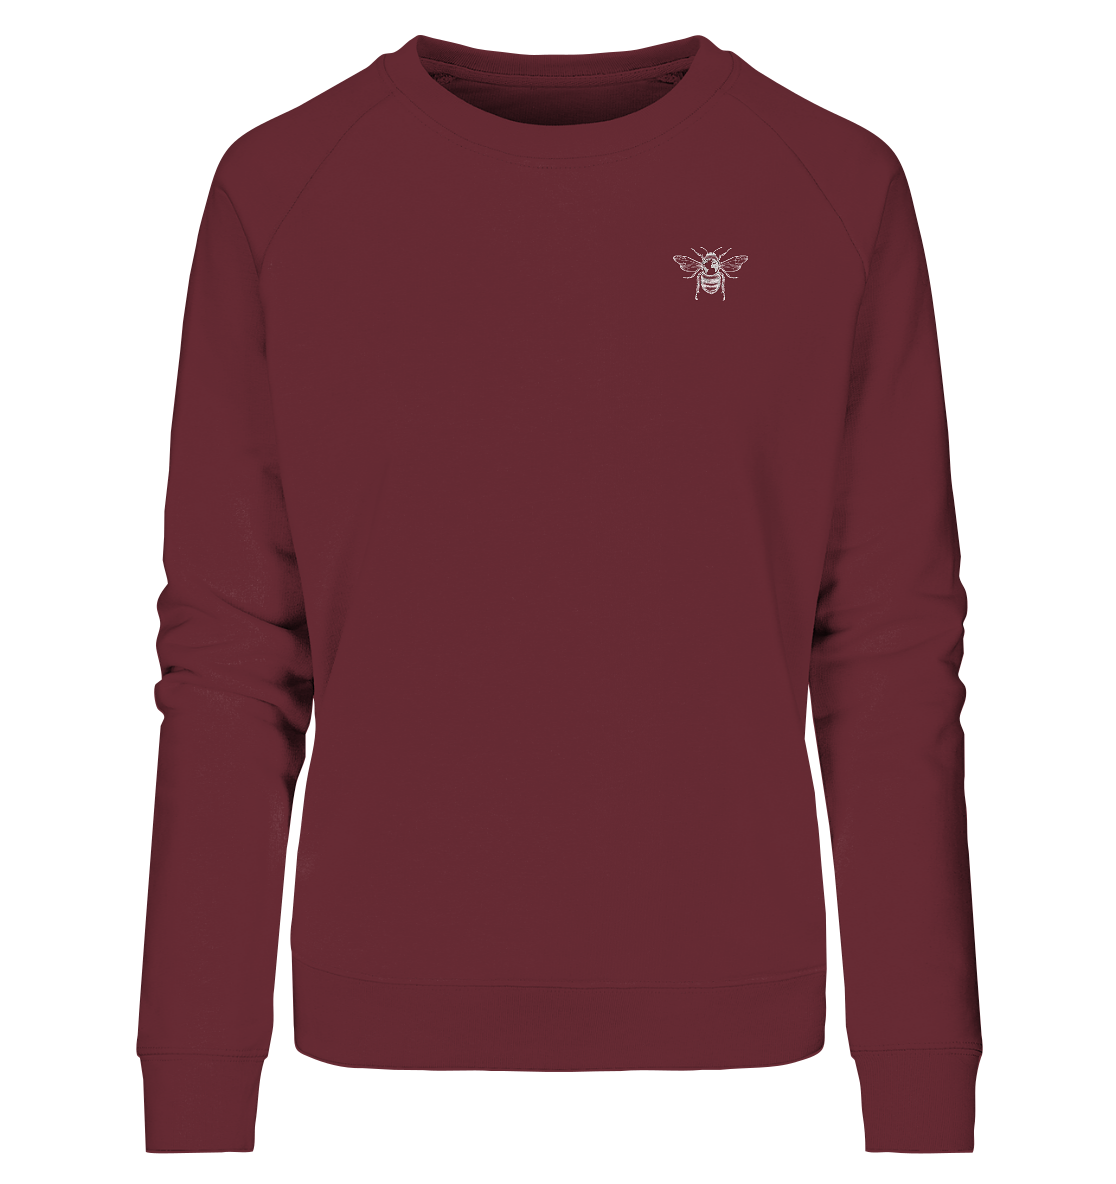 front-ladies-organic-sweatshirt-672b34-1116x.png